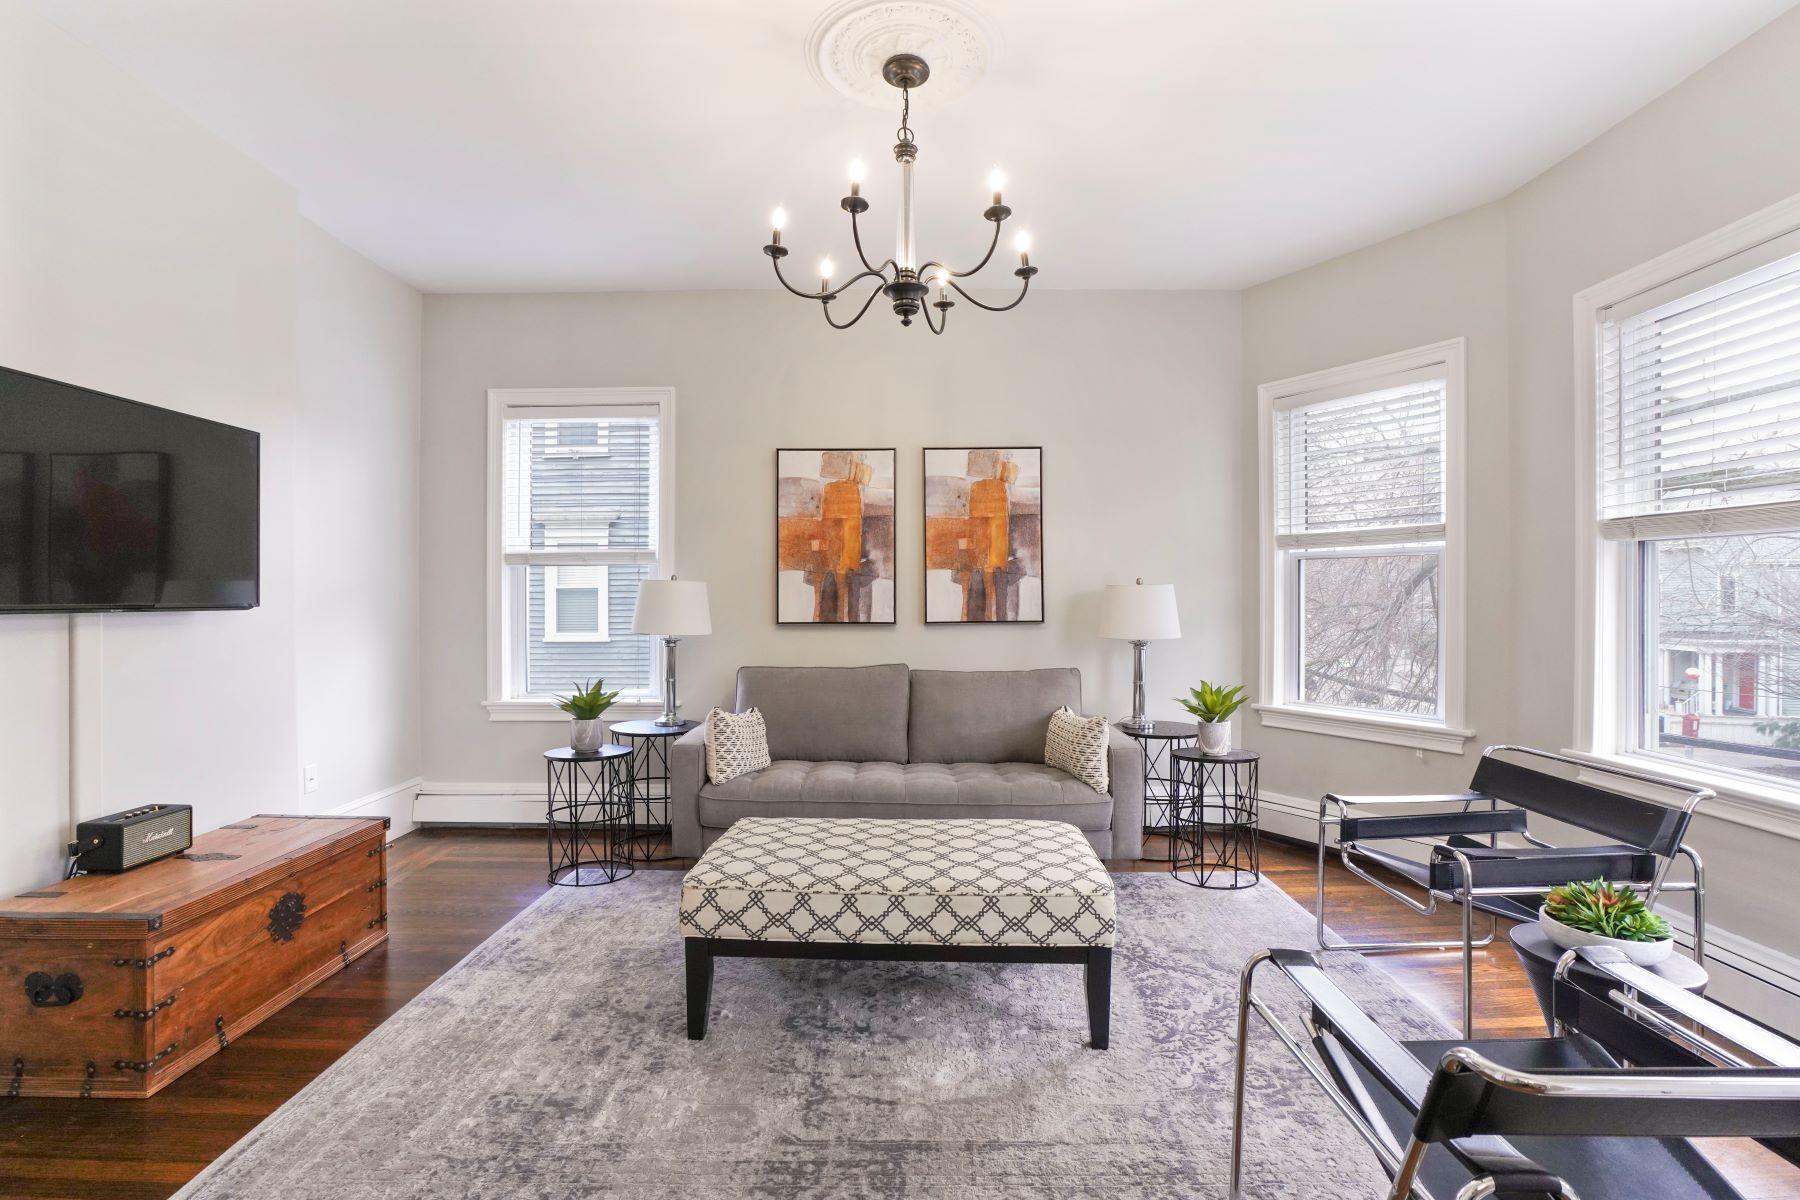 Condominiums 为 销售 在 60 Aspinwall Ave - Unit 2 60 Aspinwall Ave 2 布鲁克莱恩, 马萨诸塞州 02446 美国